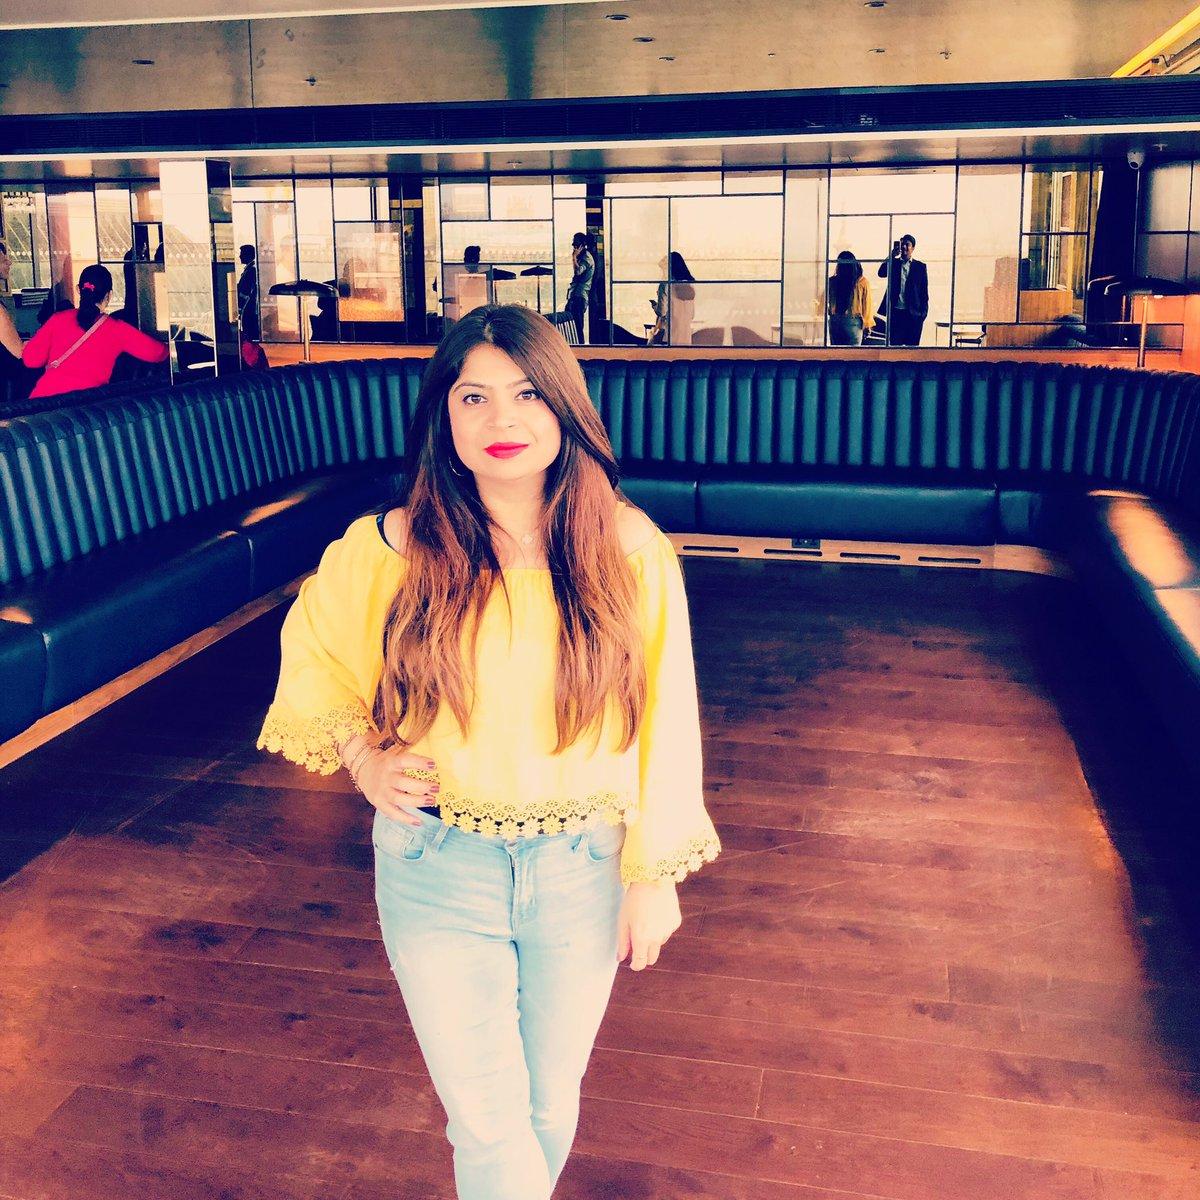 Join @shinnysheena @LycaRadio1458 #sundayfunday #sundayspecial 4-7pm #merawalacountdown #lycatop20 #bollywoodcountdown #alist #hitmusic #sunnyday #britishsummertime #bankholiday #festivetime #beachtime #summercolors which is your fav #color #fashionista #lifestyle